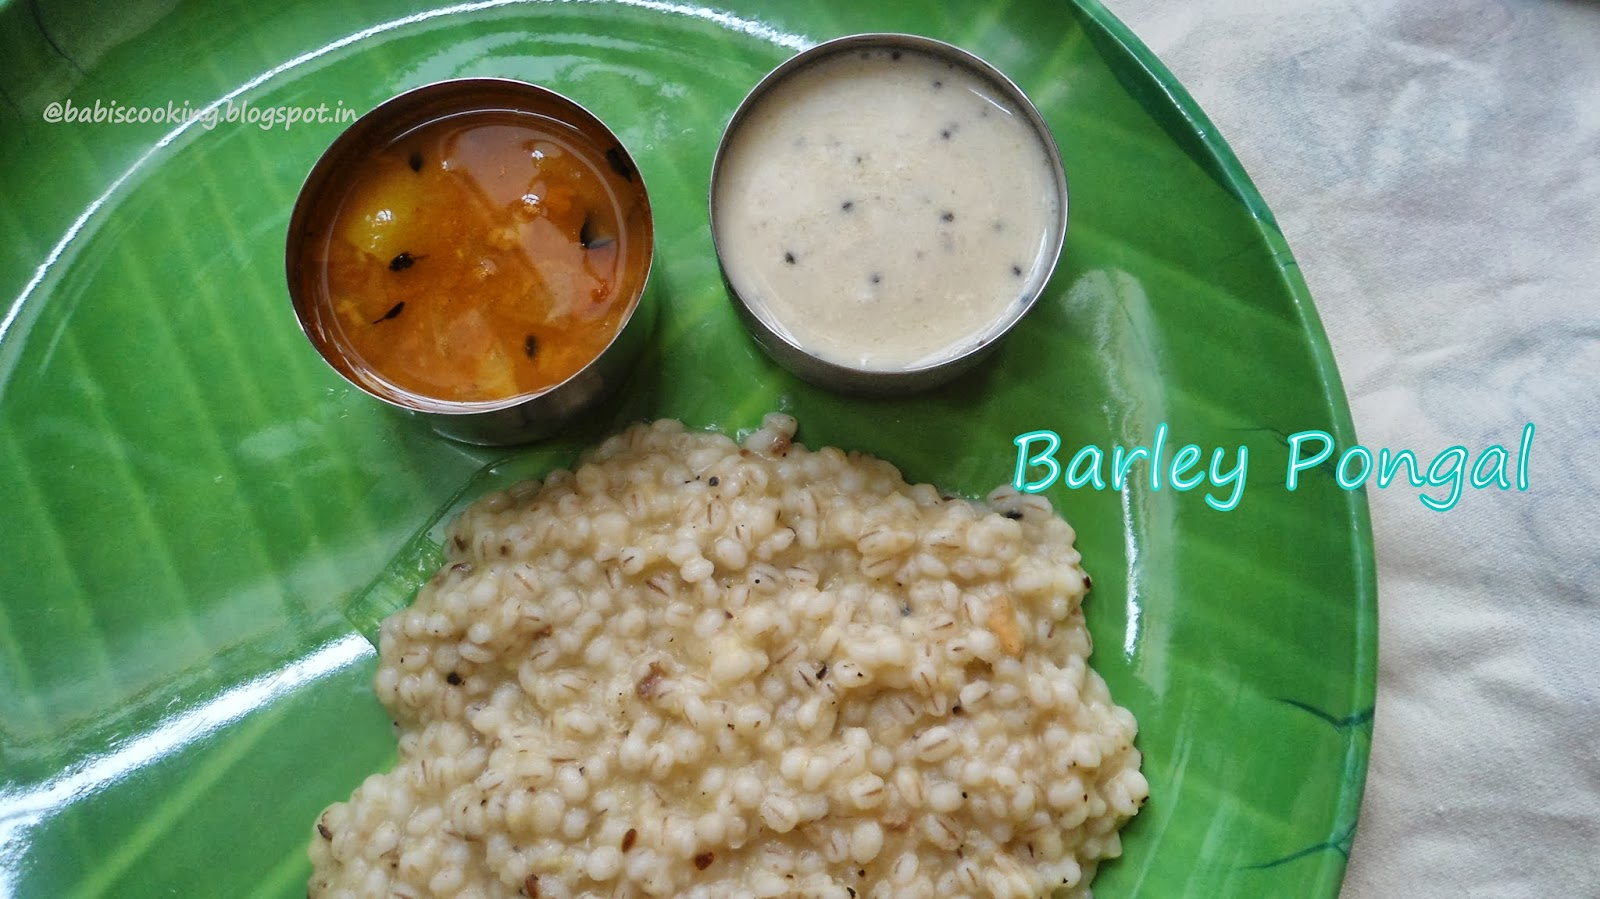 Babi 's Recipes: Barley Pongal   Healthy Indian Breakfast